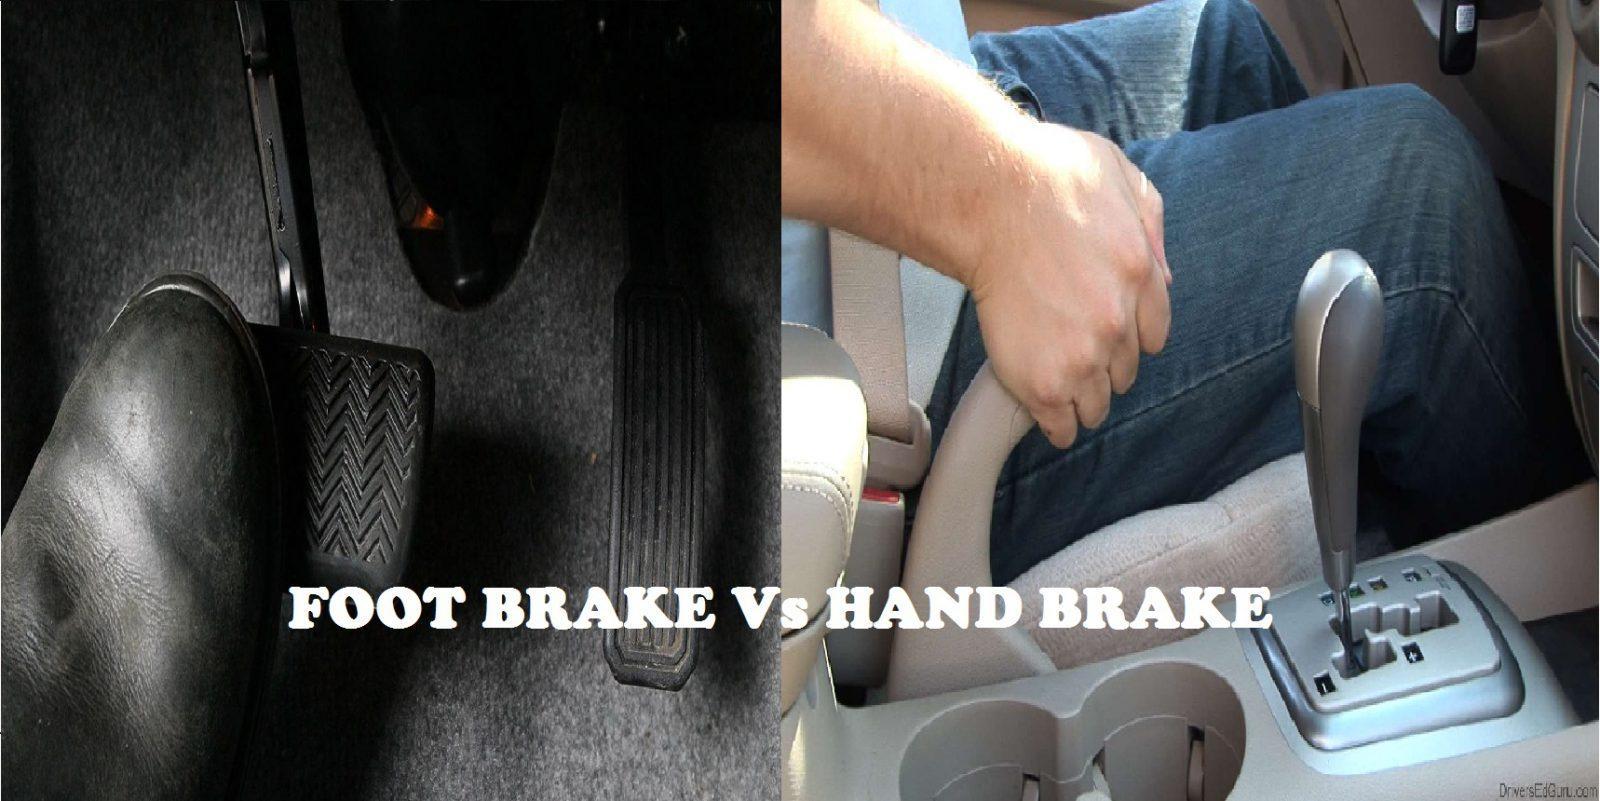 Nissan Rogue Service Manual: Parking brake shoe